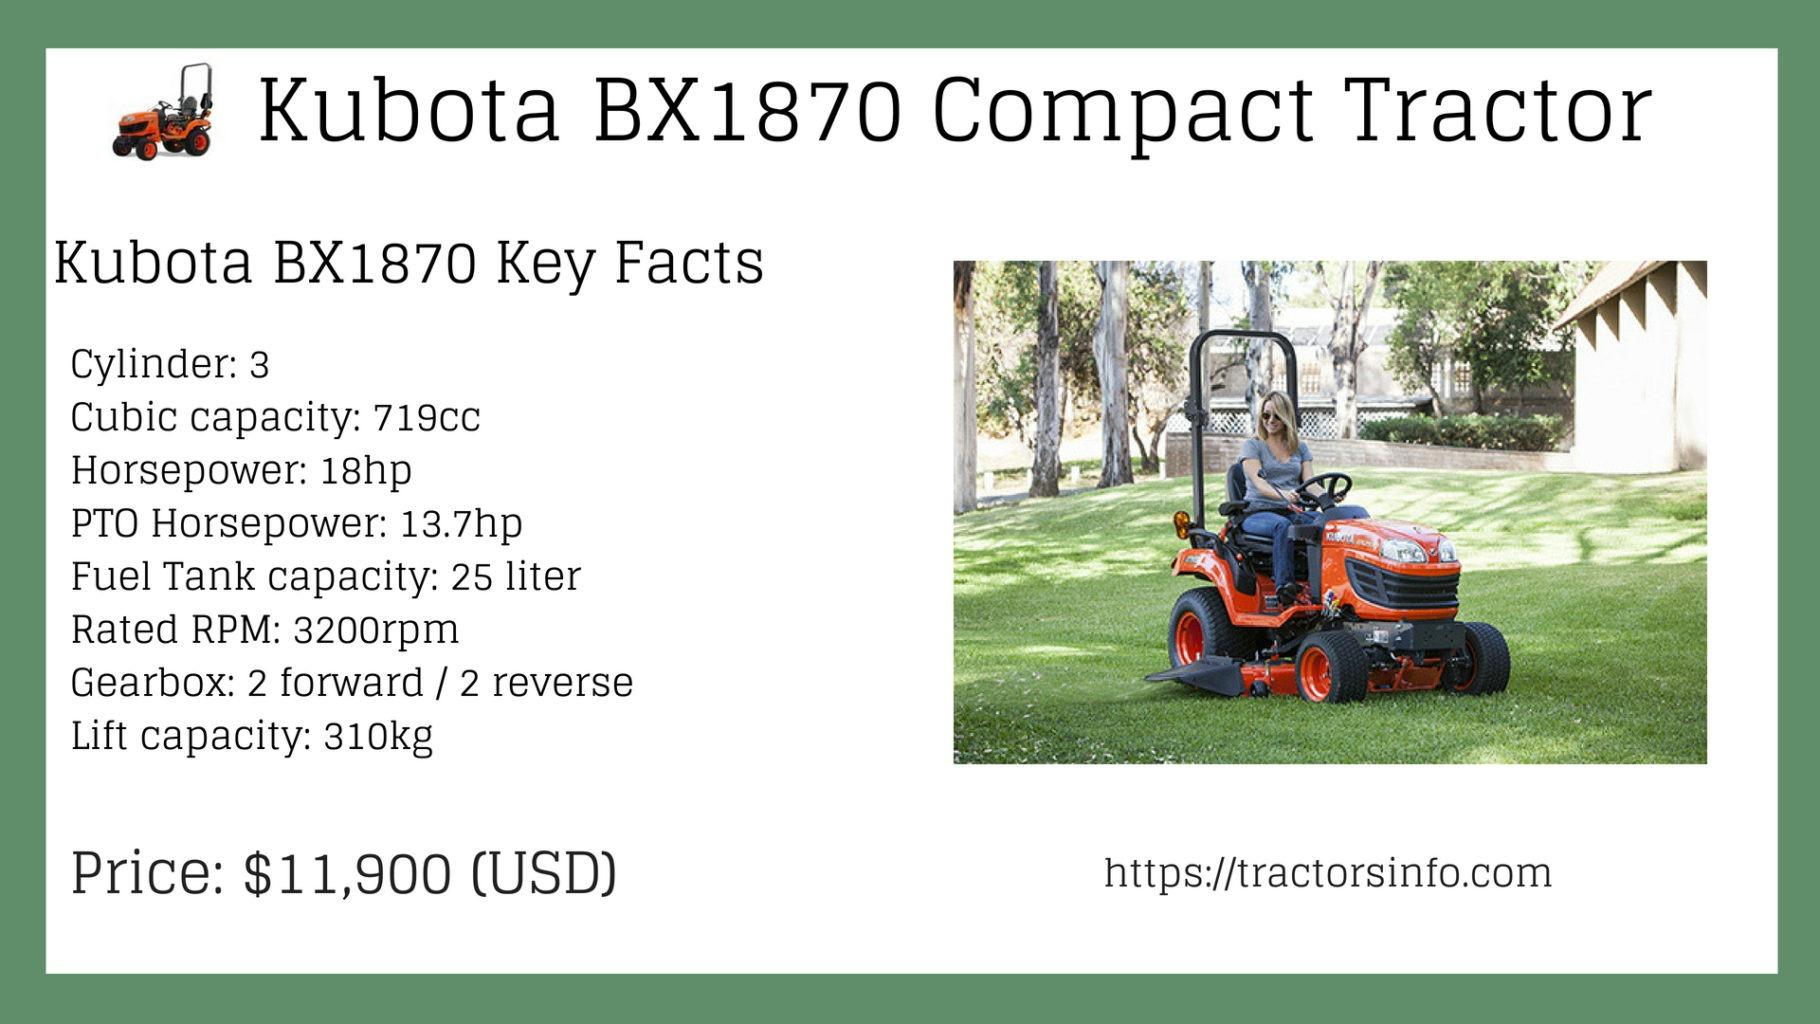 Kubota BX1870 compact tractor